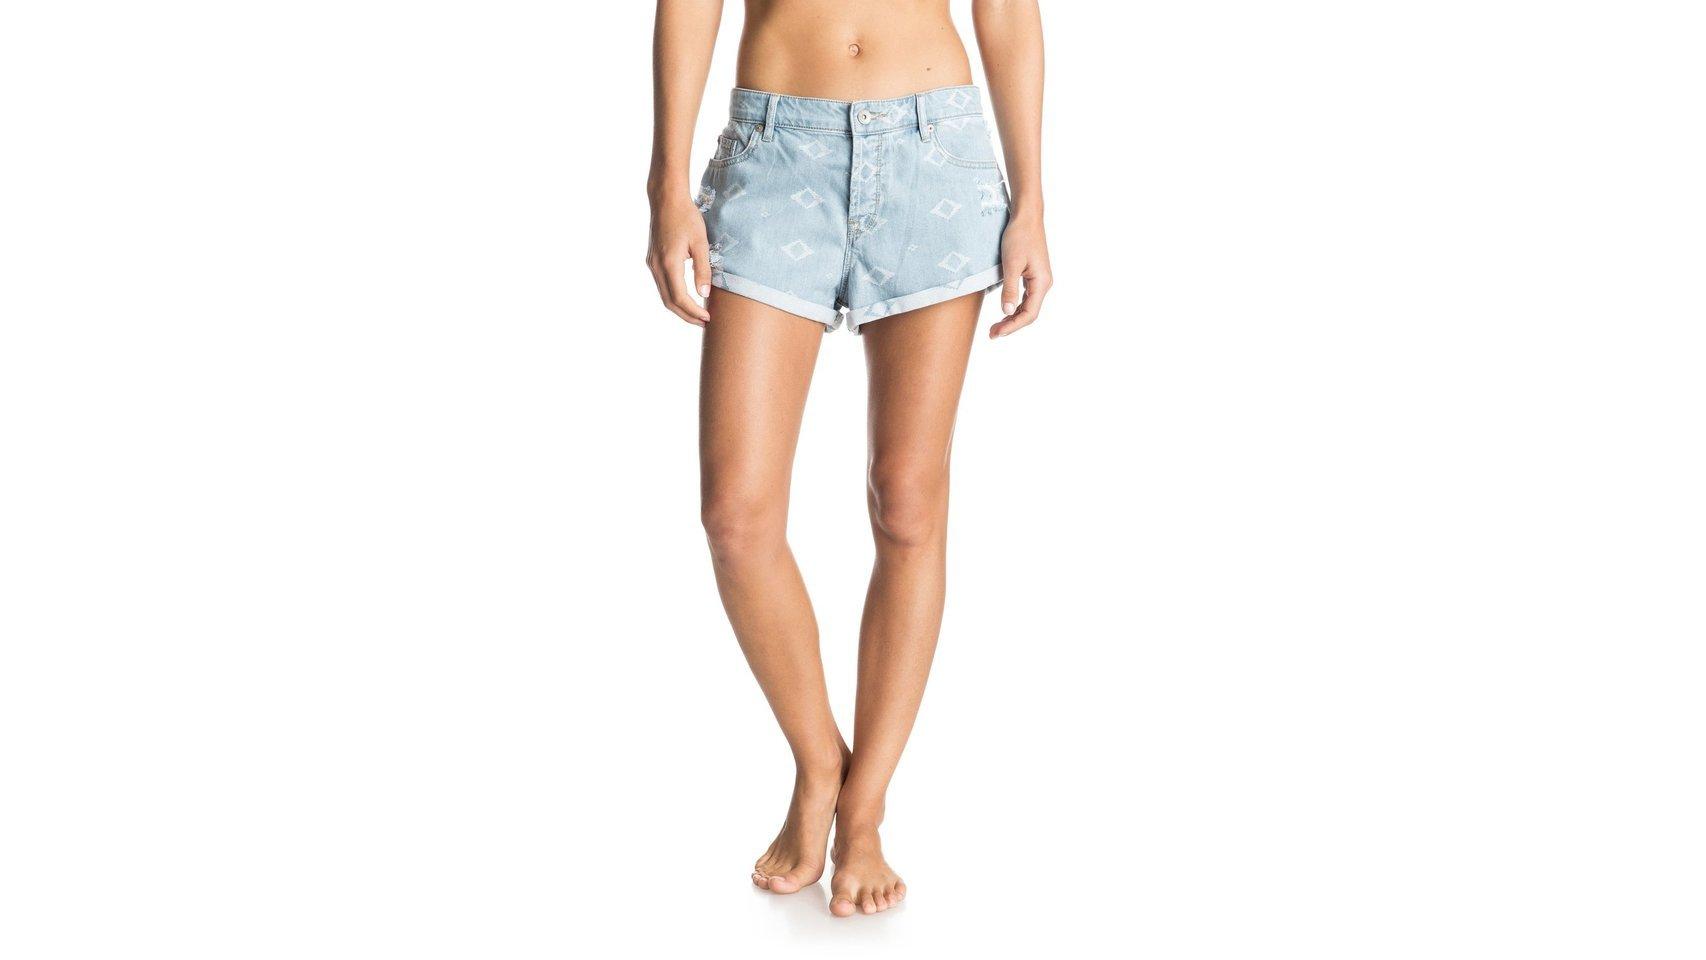 Pantalón corto denim de Roxy (61,00 Euros).